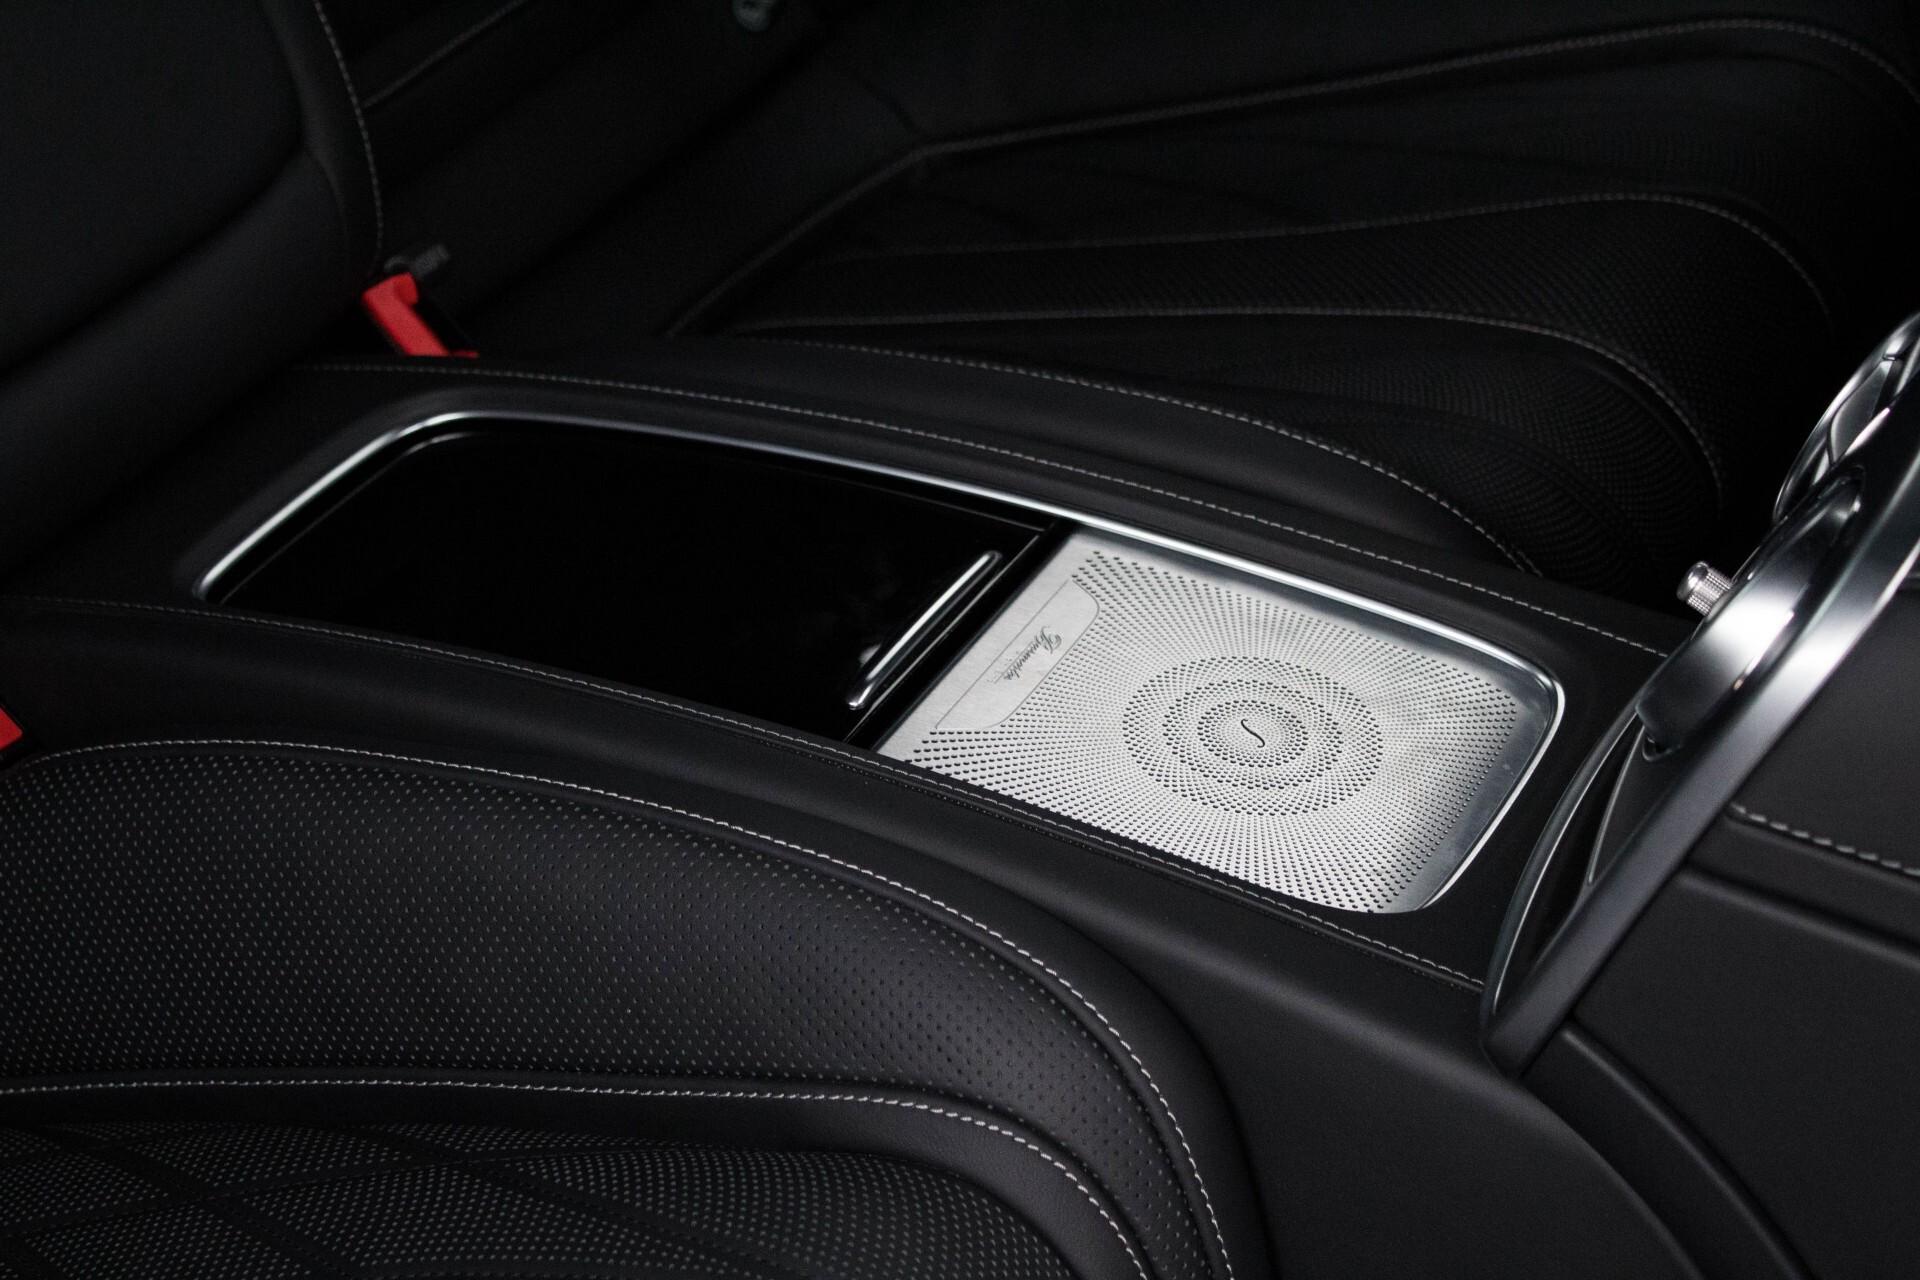 Mercedes-Benz S-Klasse Cabrio 63 AMG 4-M Ceramic/Designo/Carbon/Burmester High End Aut Foto 28